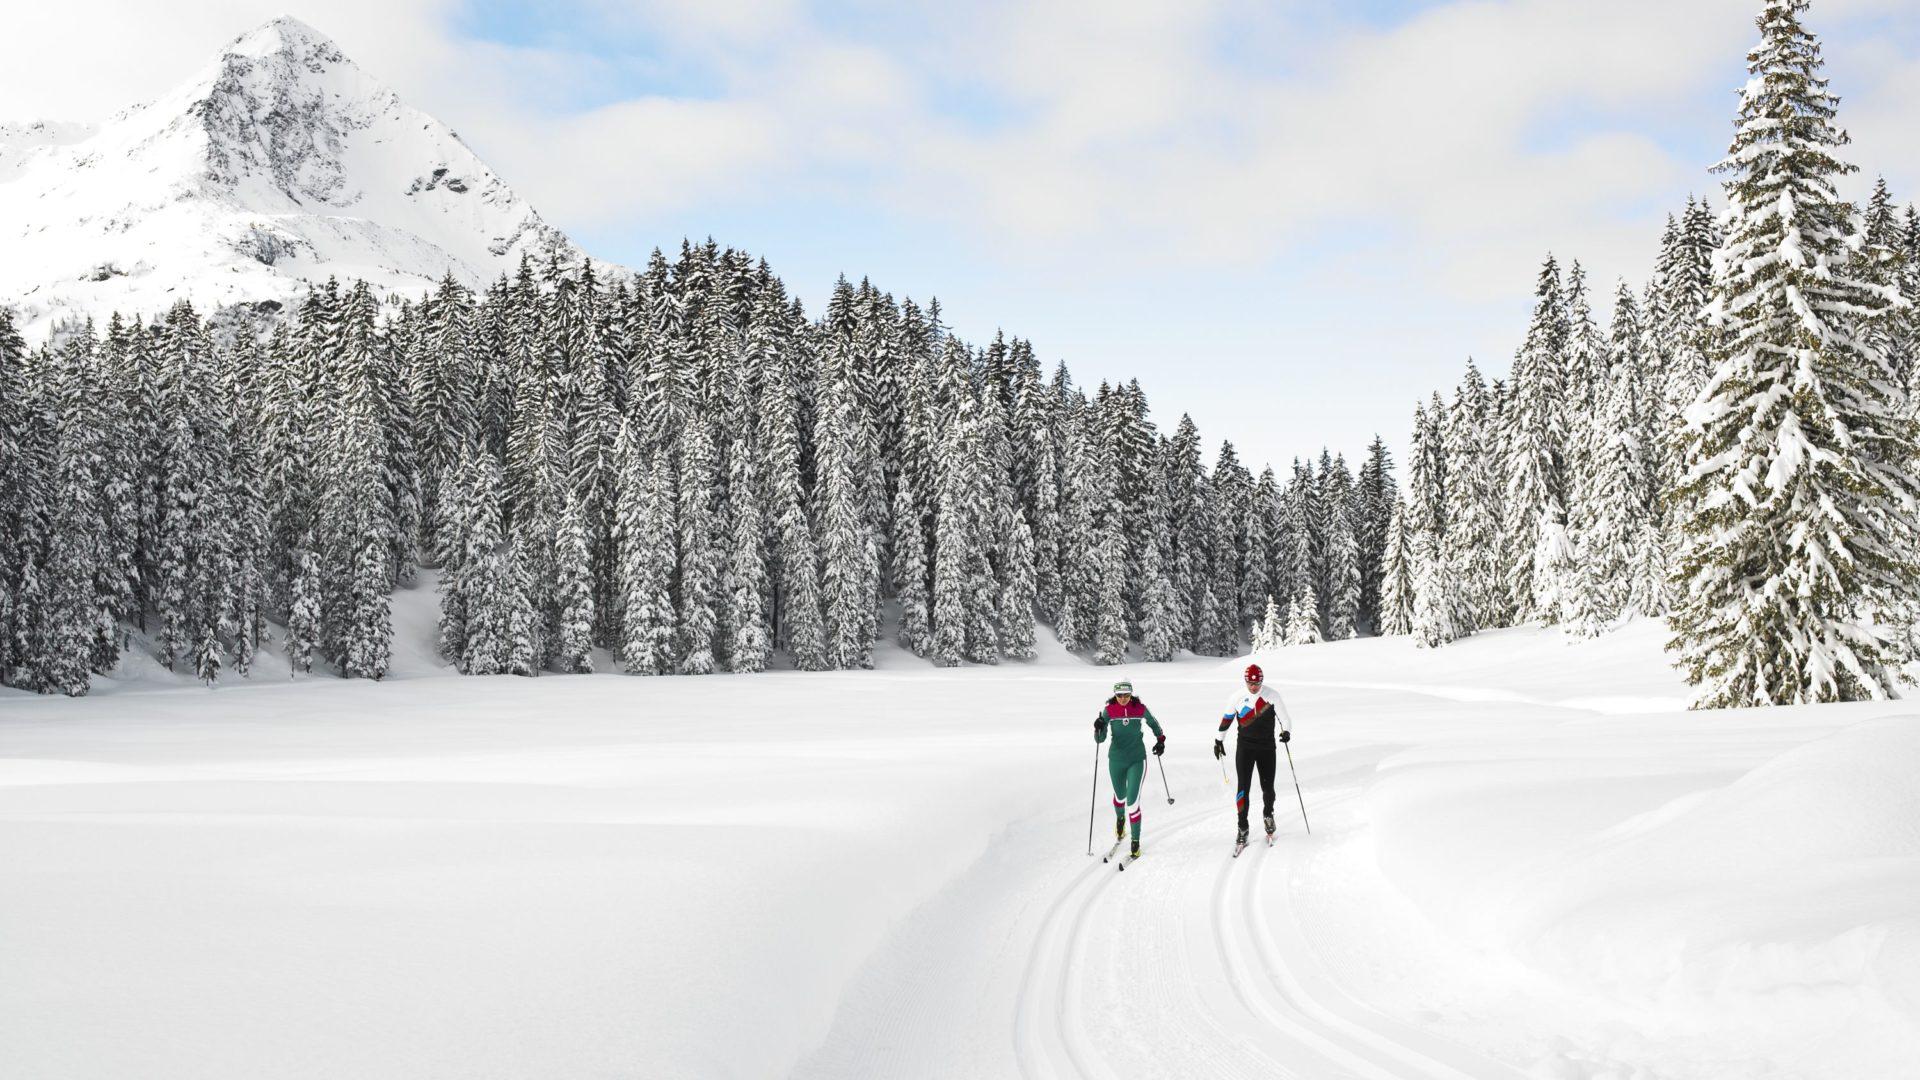 Langlaufen im Montafon (c) Alex Kaiser / Montafon Tourismus